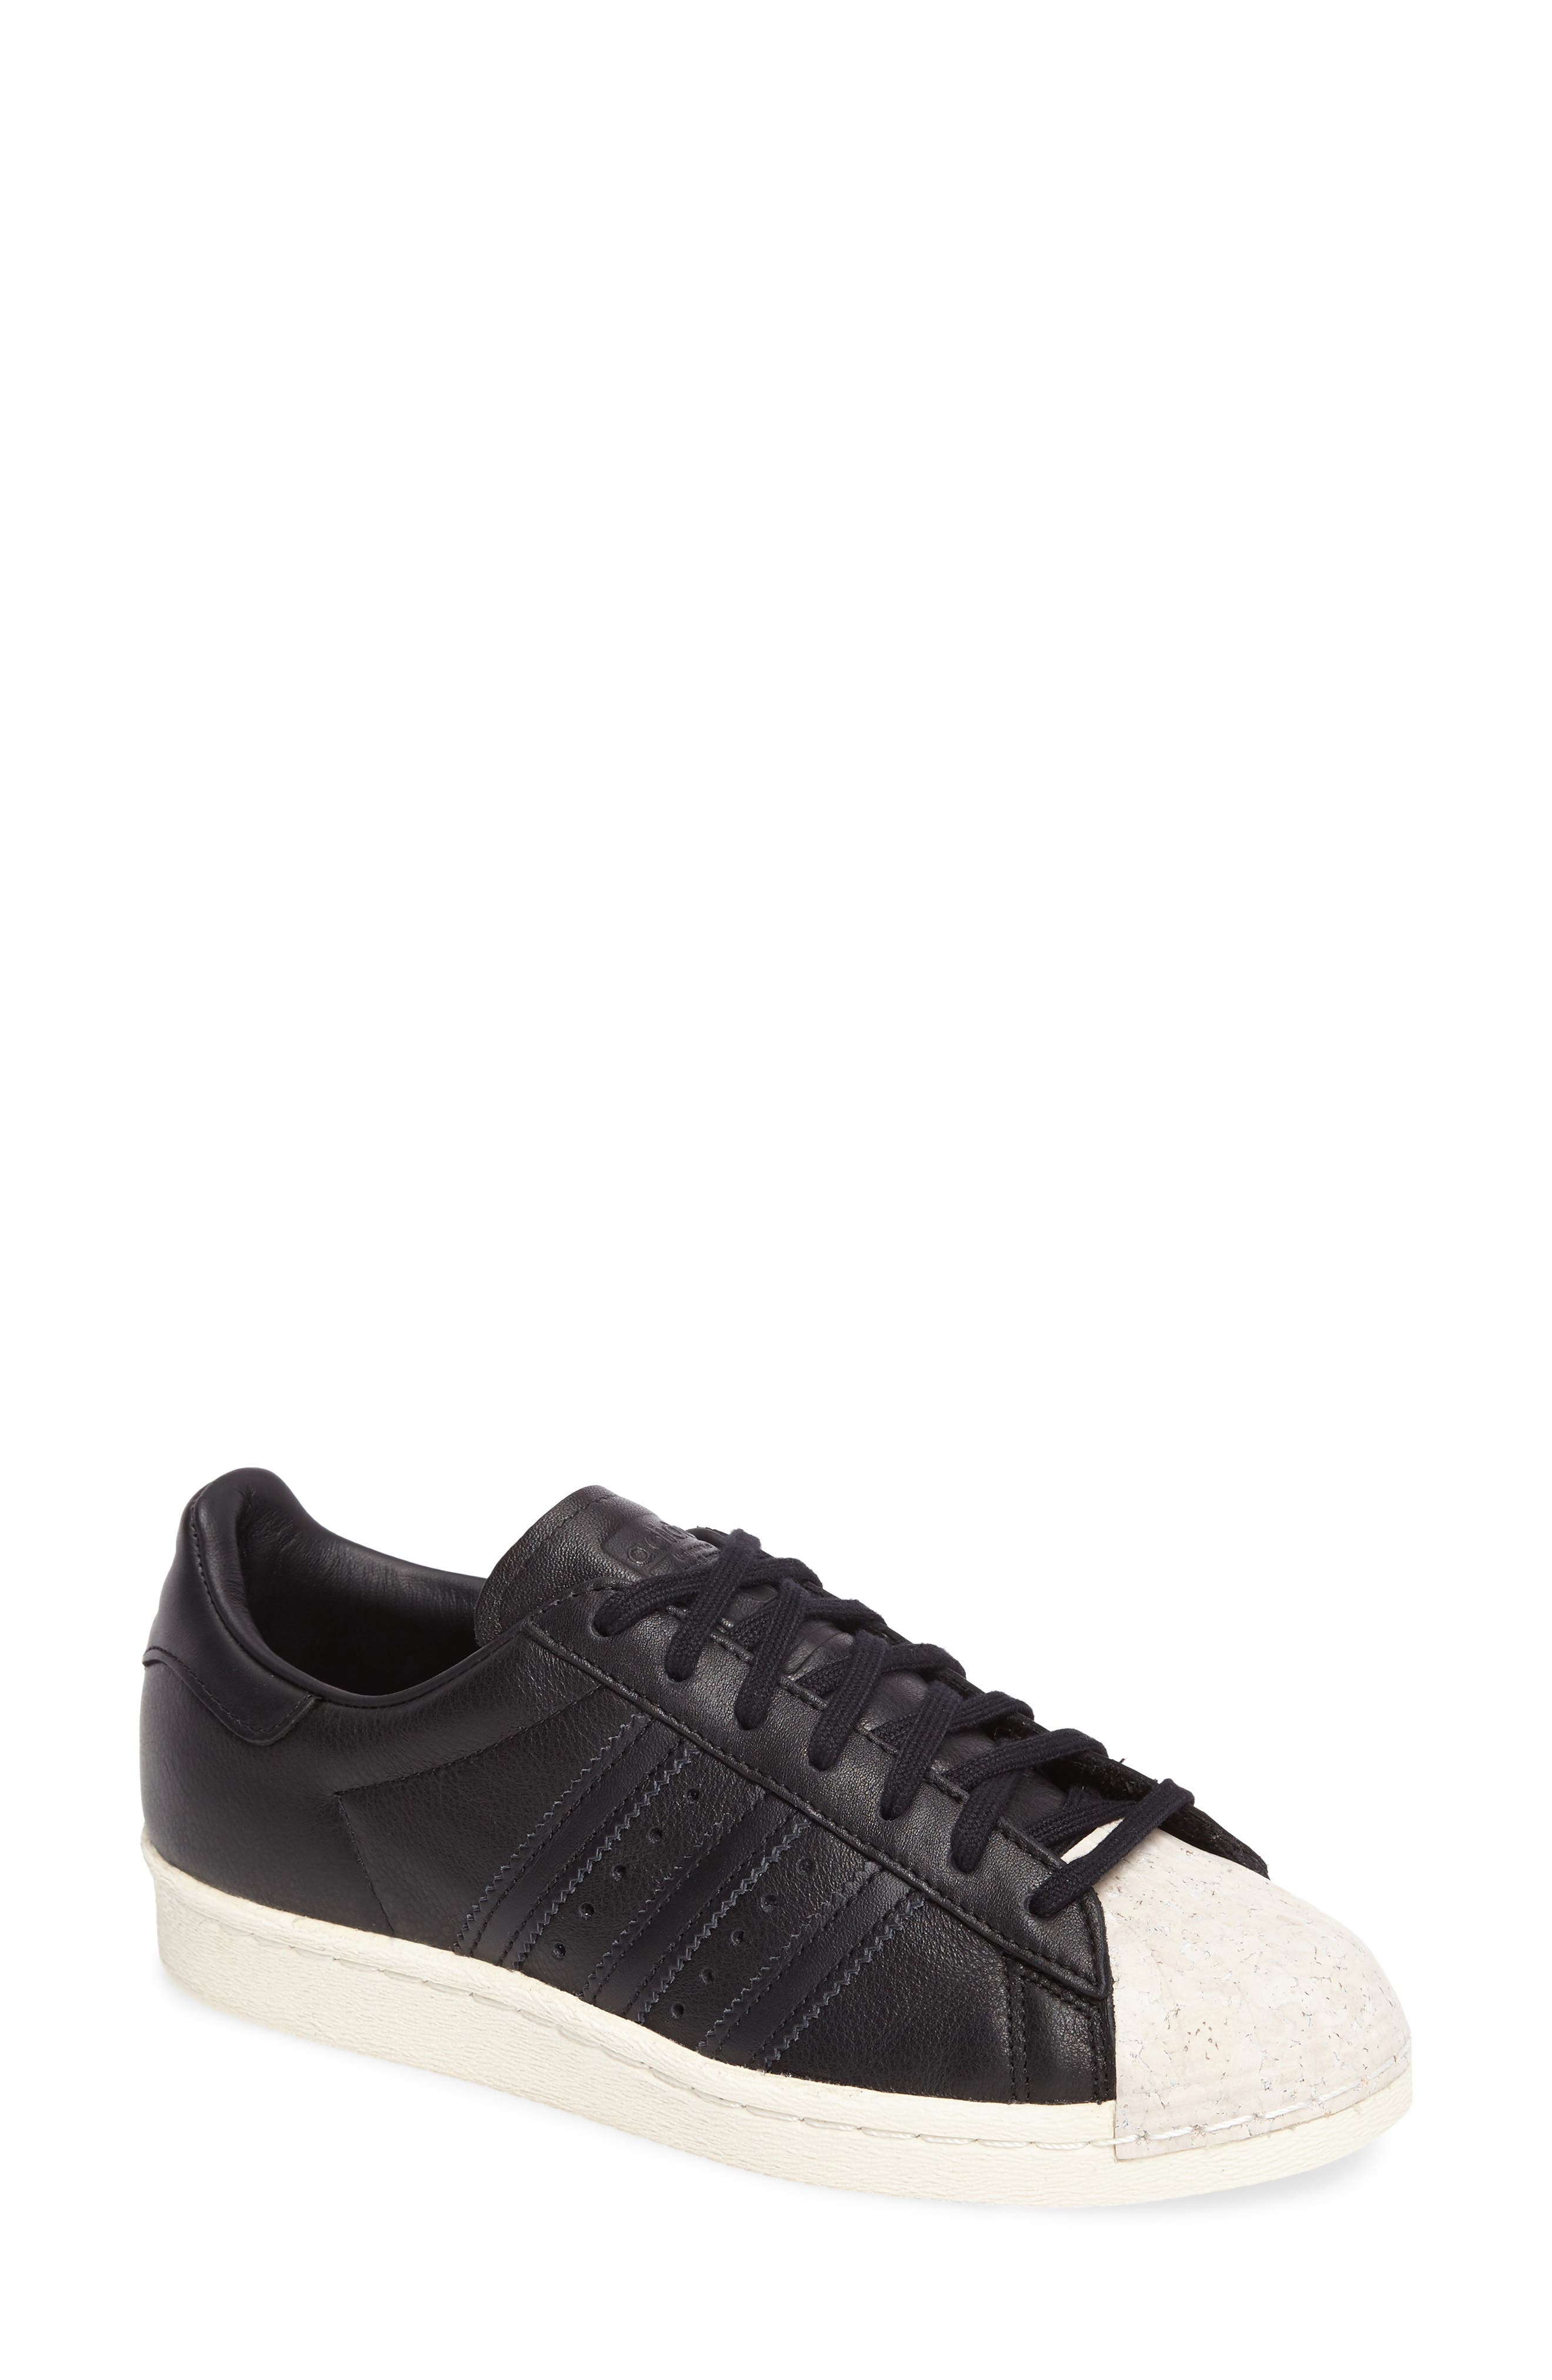 Superstar 80s Sneaker,                         Main,                         color, 001